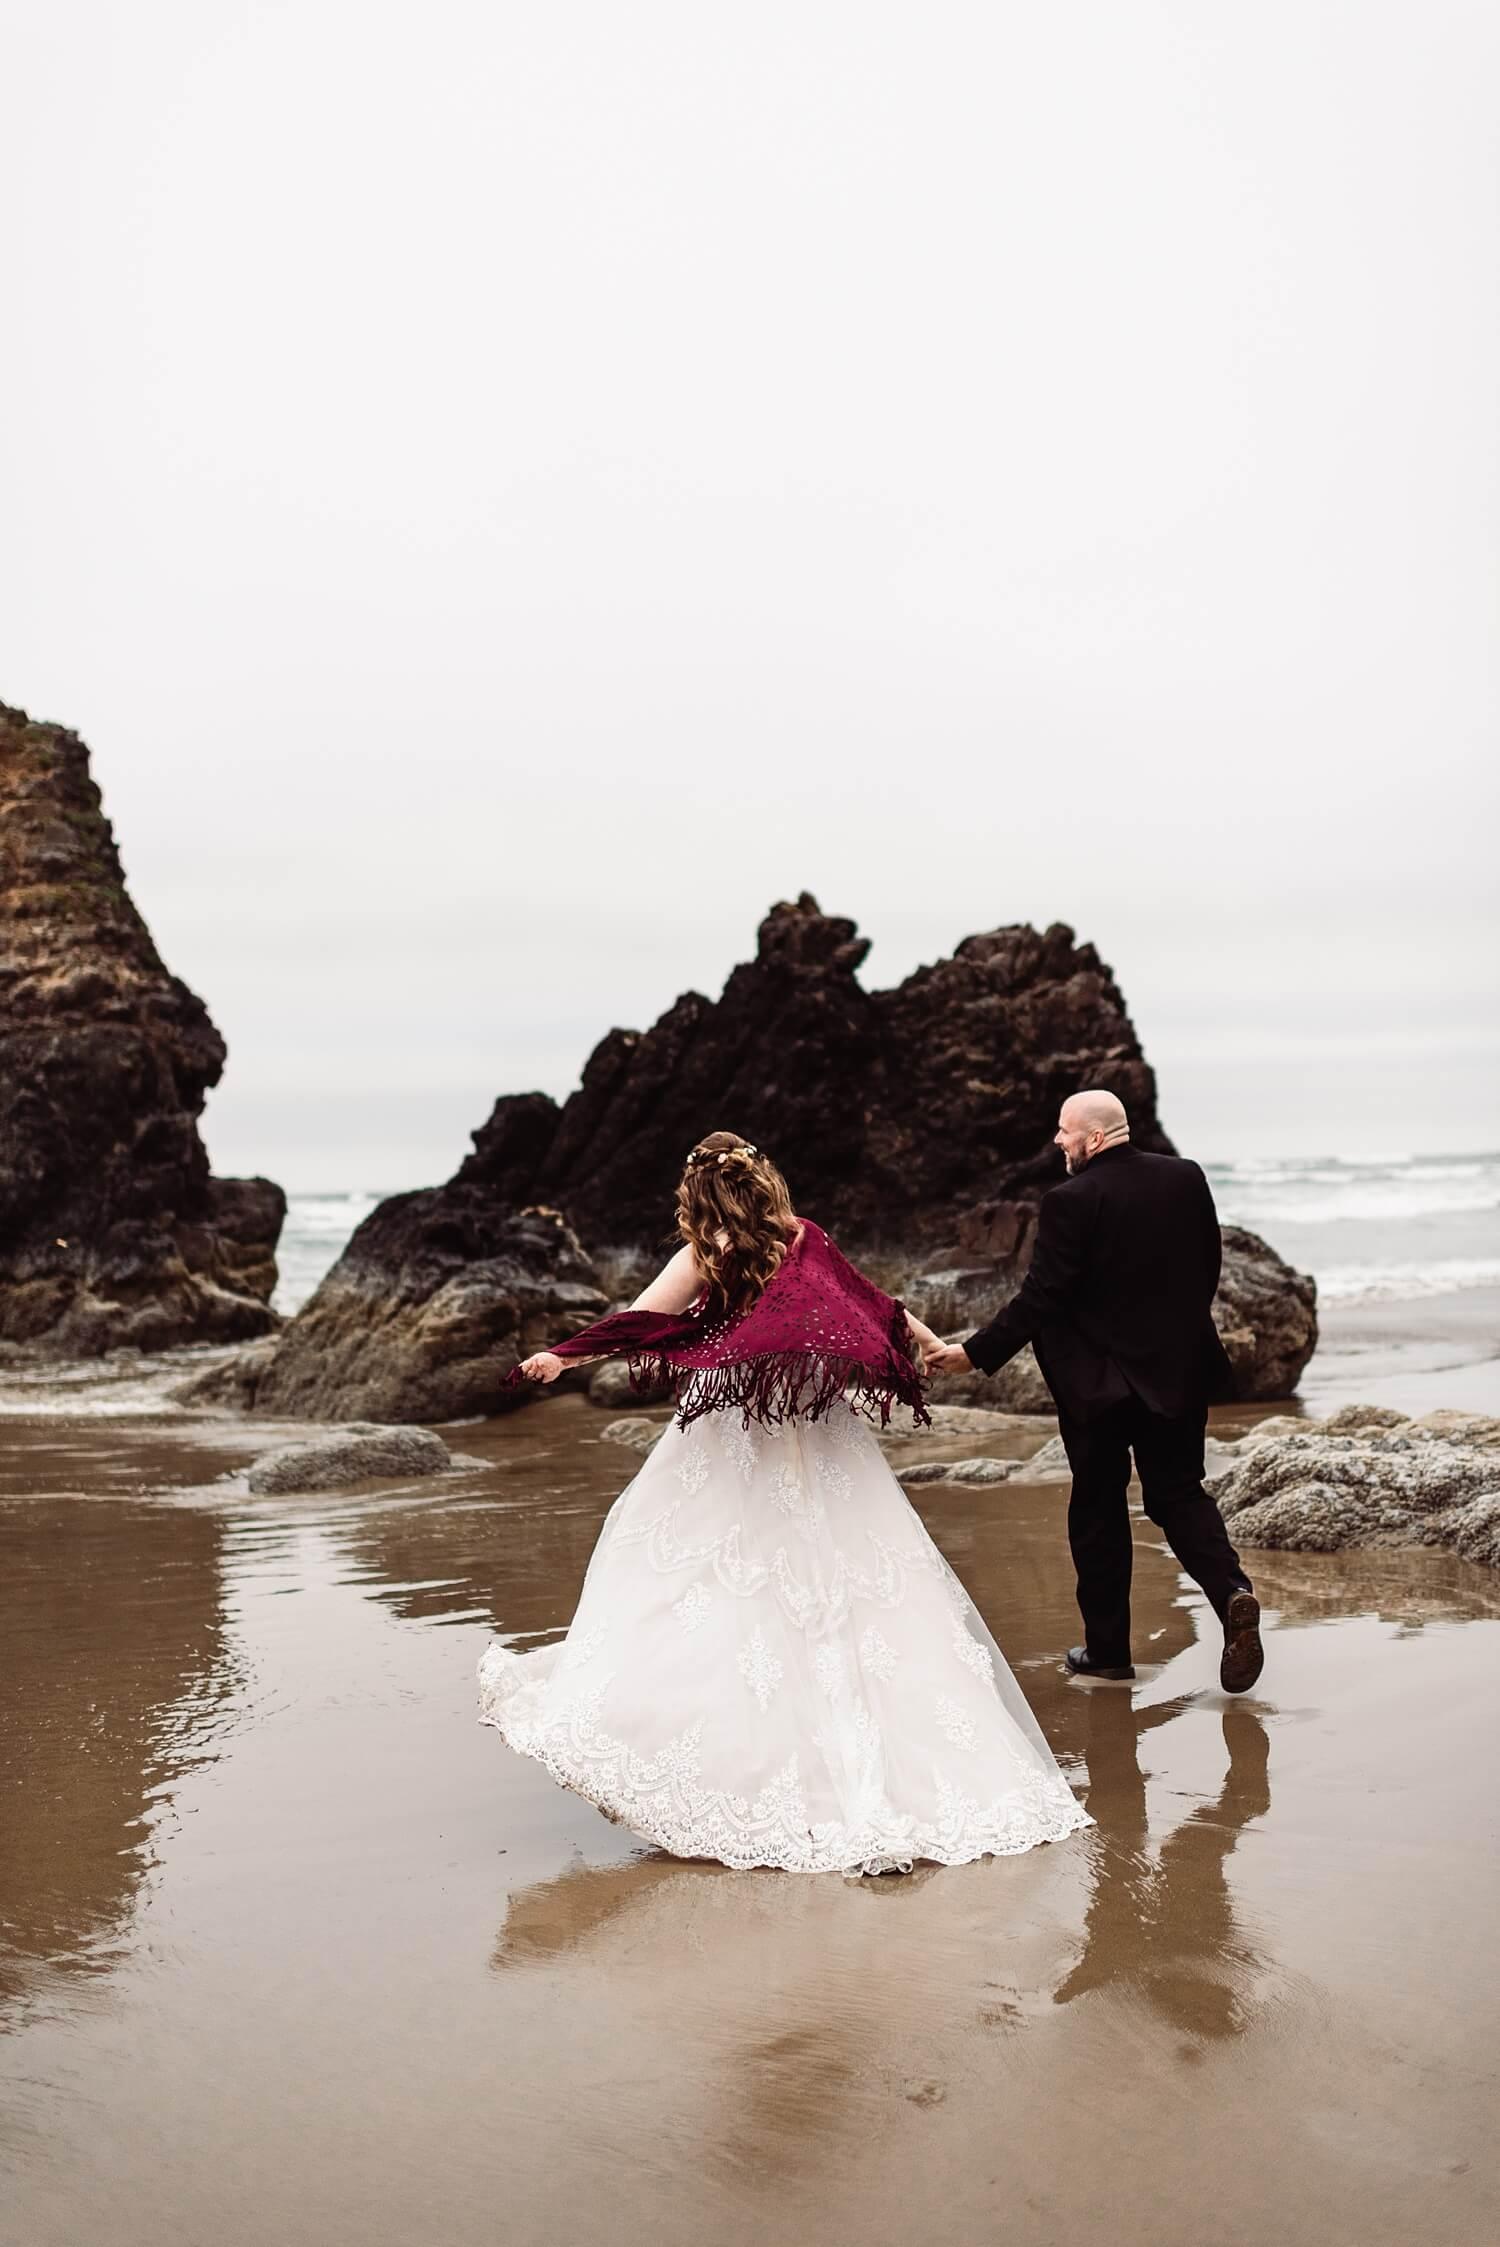 Elope in Oregon,Oregon Coast Elopement,adventure elopement photographer,arcadia beach,boho wedding,cannon beach,oregon wedding photographer,pacific northwest,tiny wedding,